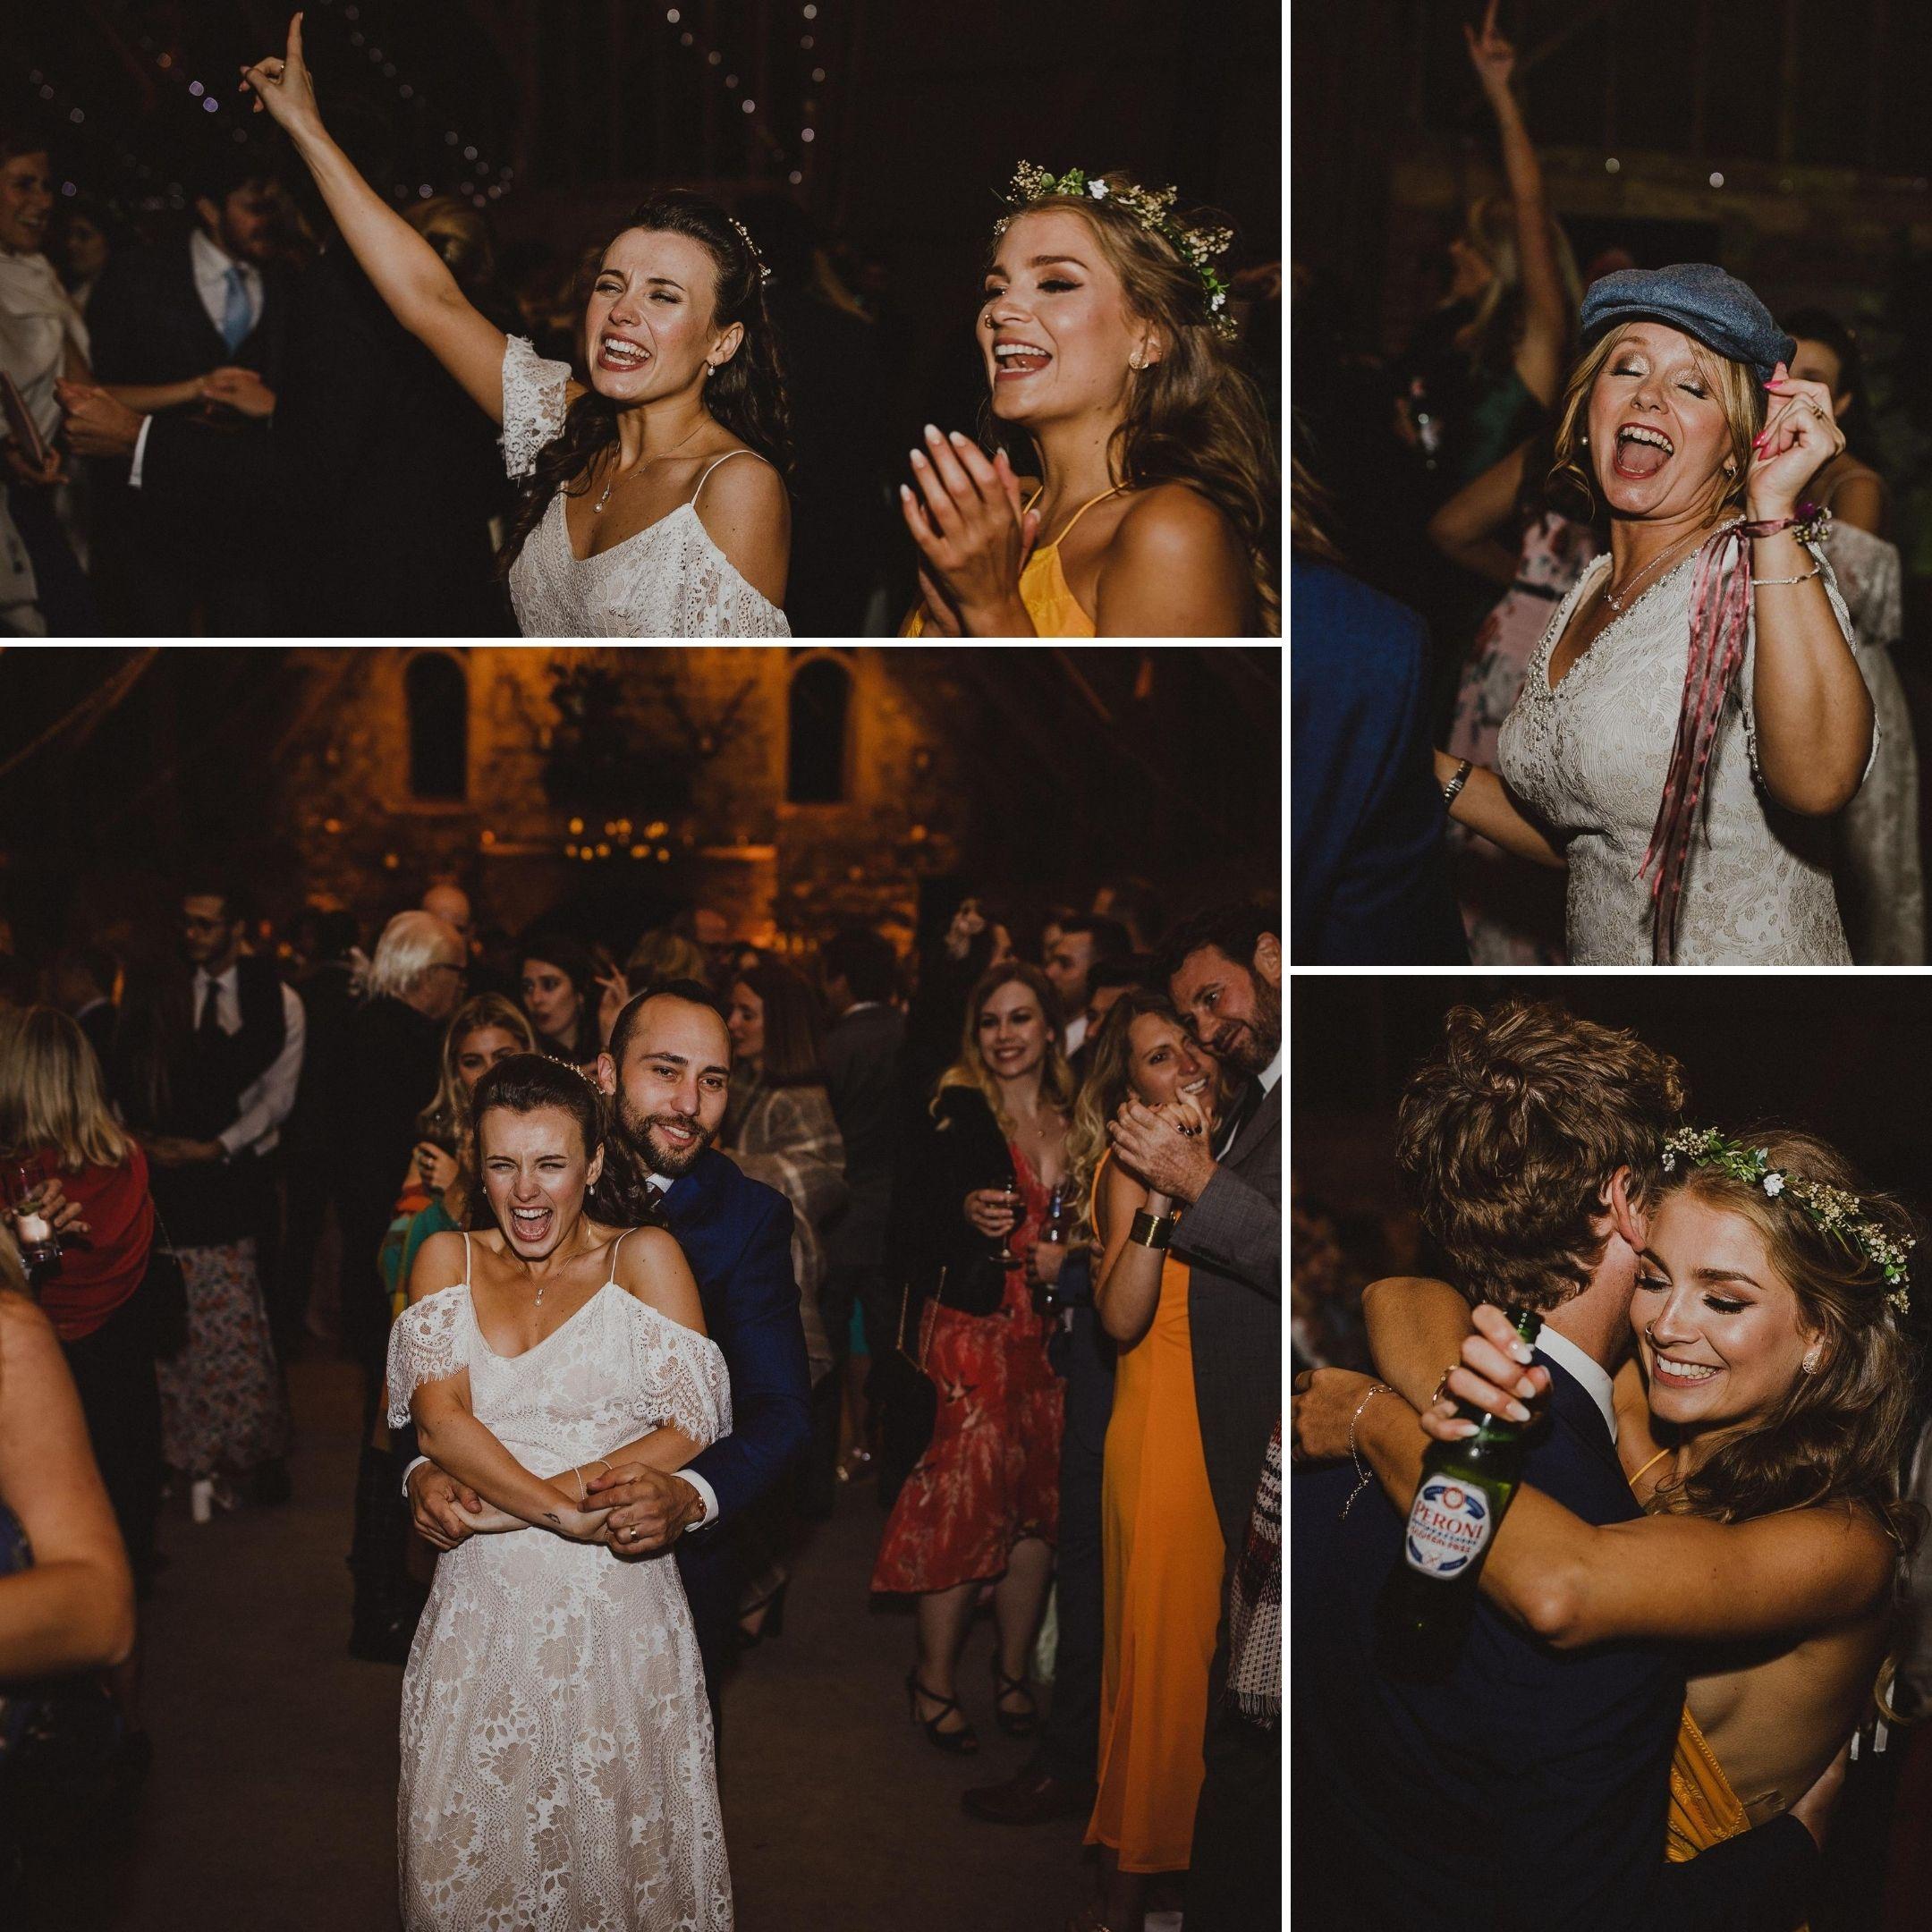 Tasha and Tom Wedding Reception